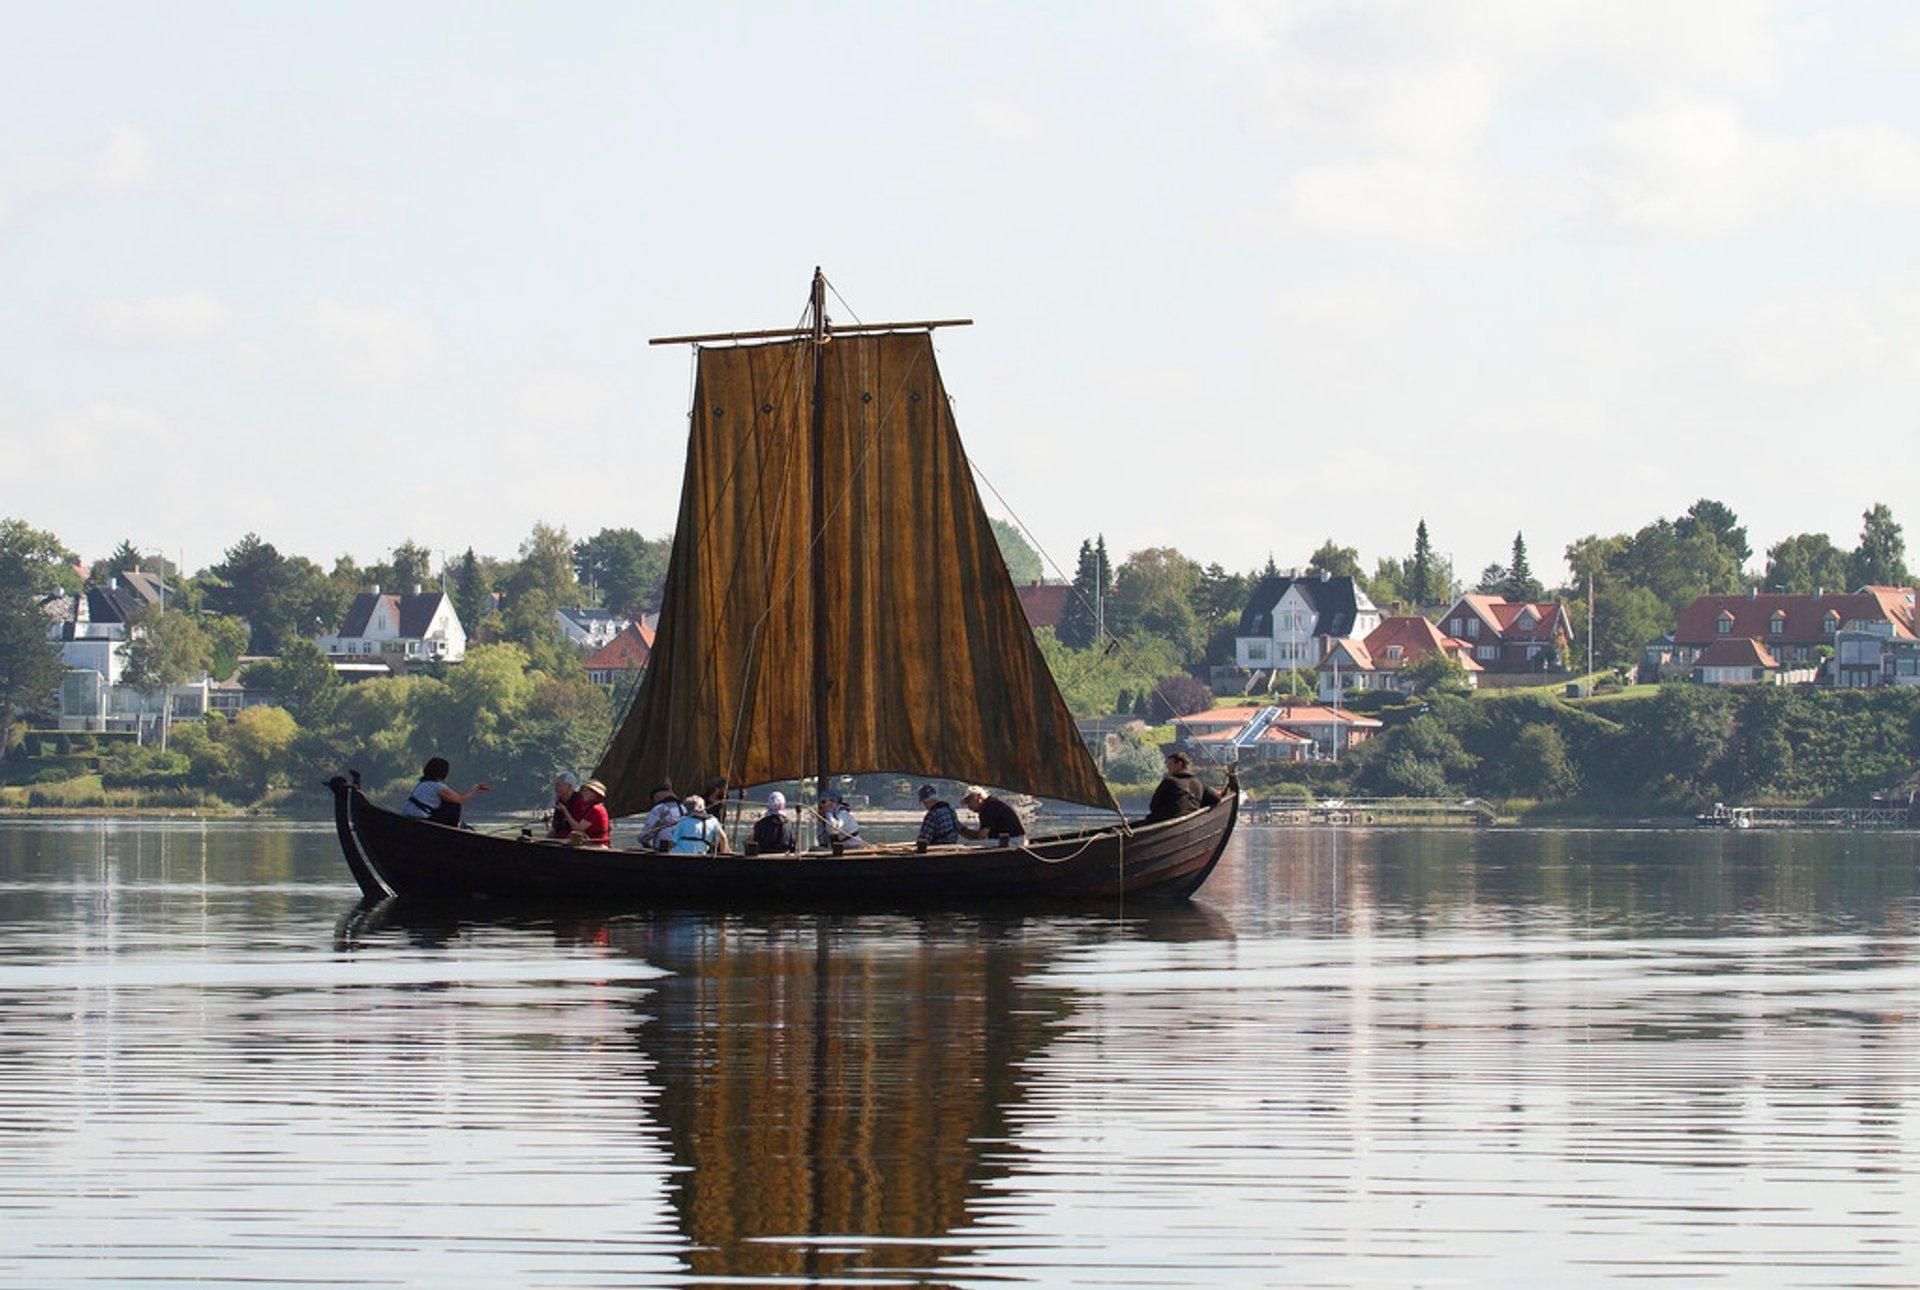 Sailing Viking Ships in Denmark 2020 - Best Time